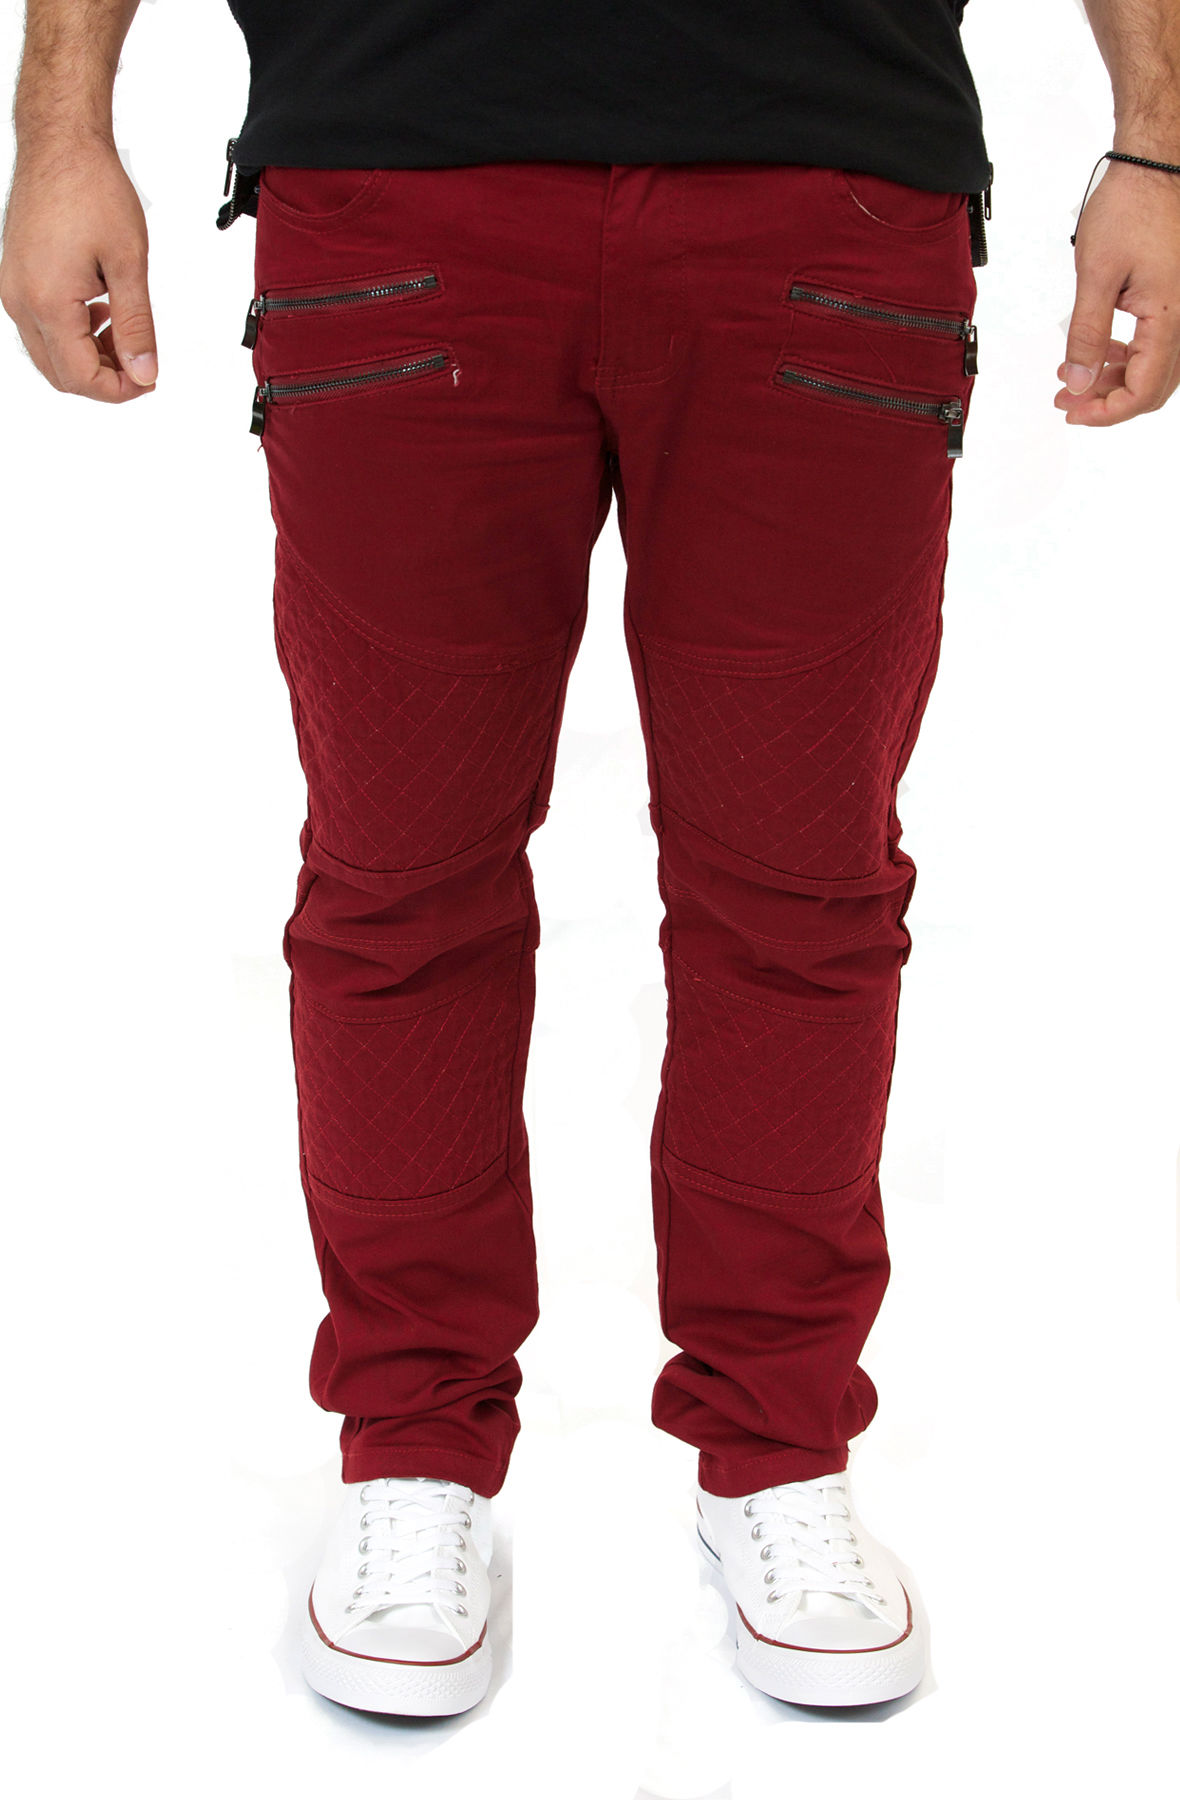 Image of Burgundy Skinny Fit Jeans